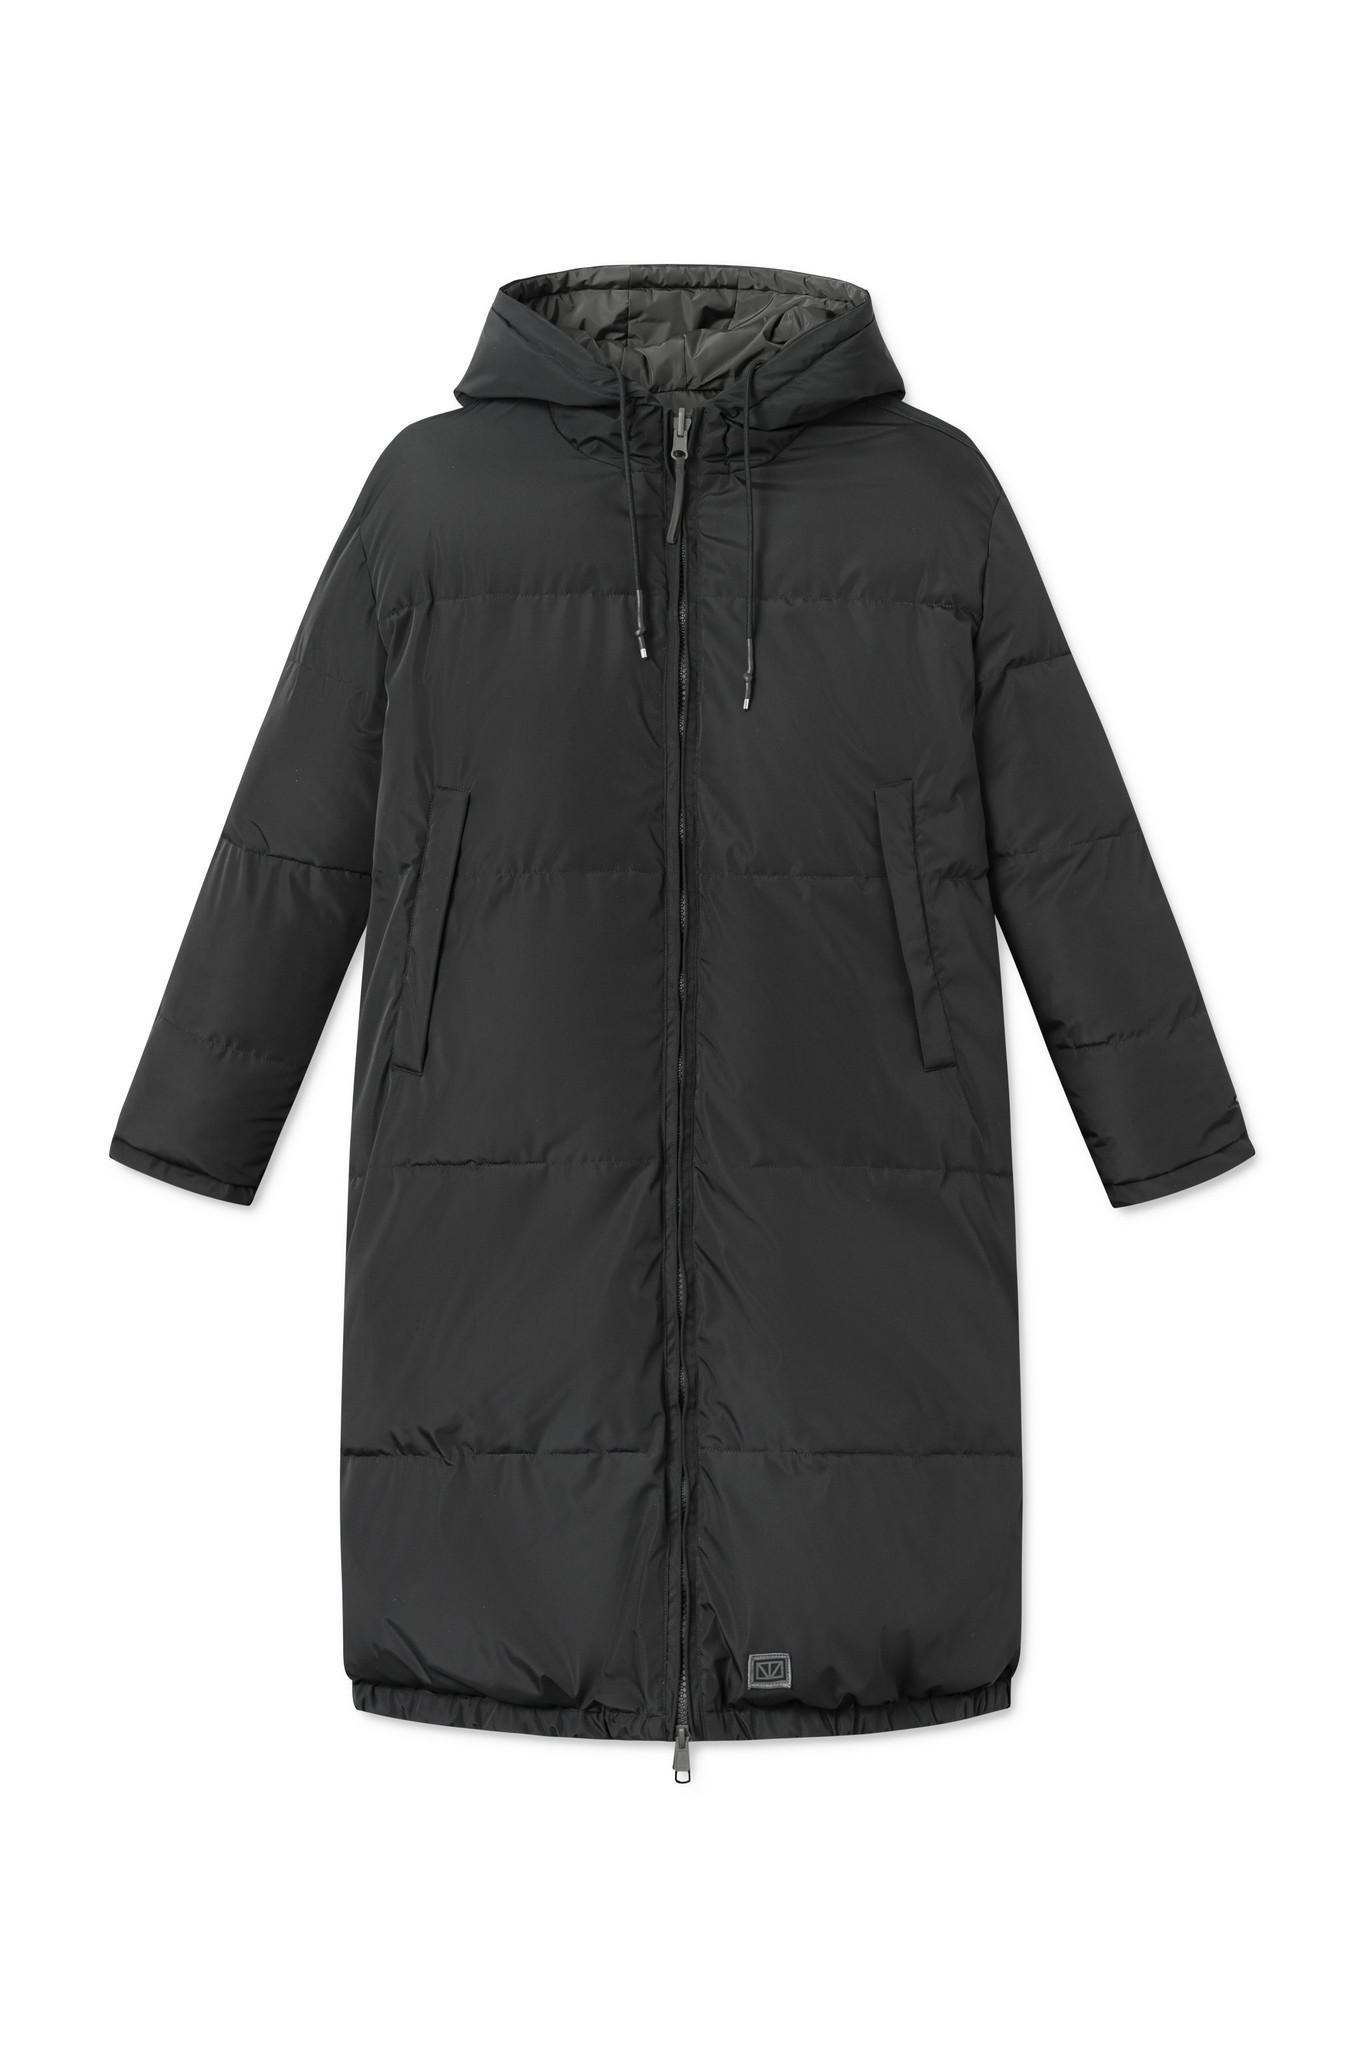 Rhymes Reversible Puffer Jacket Black Olive-3